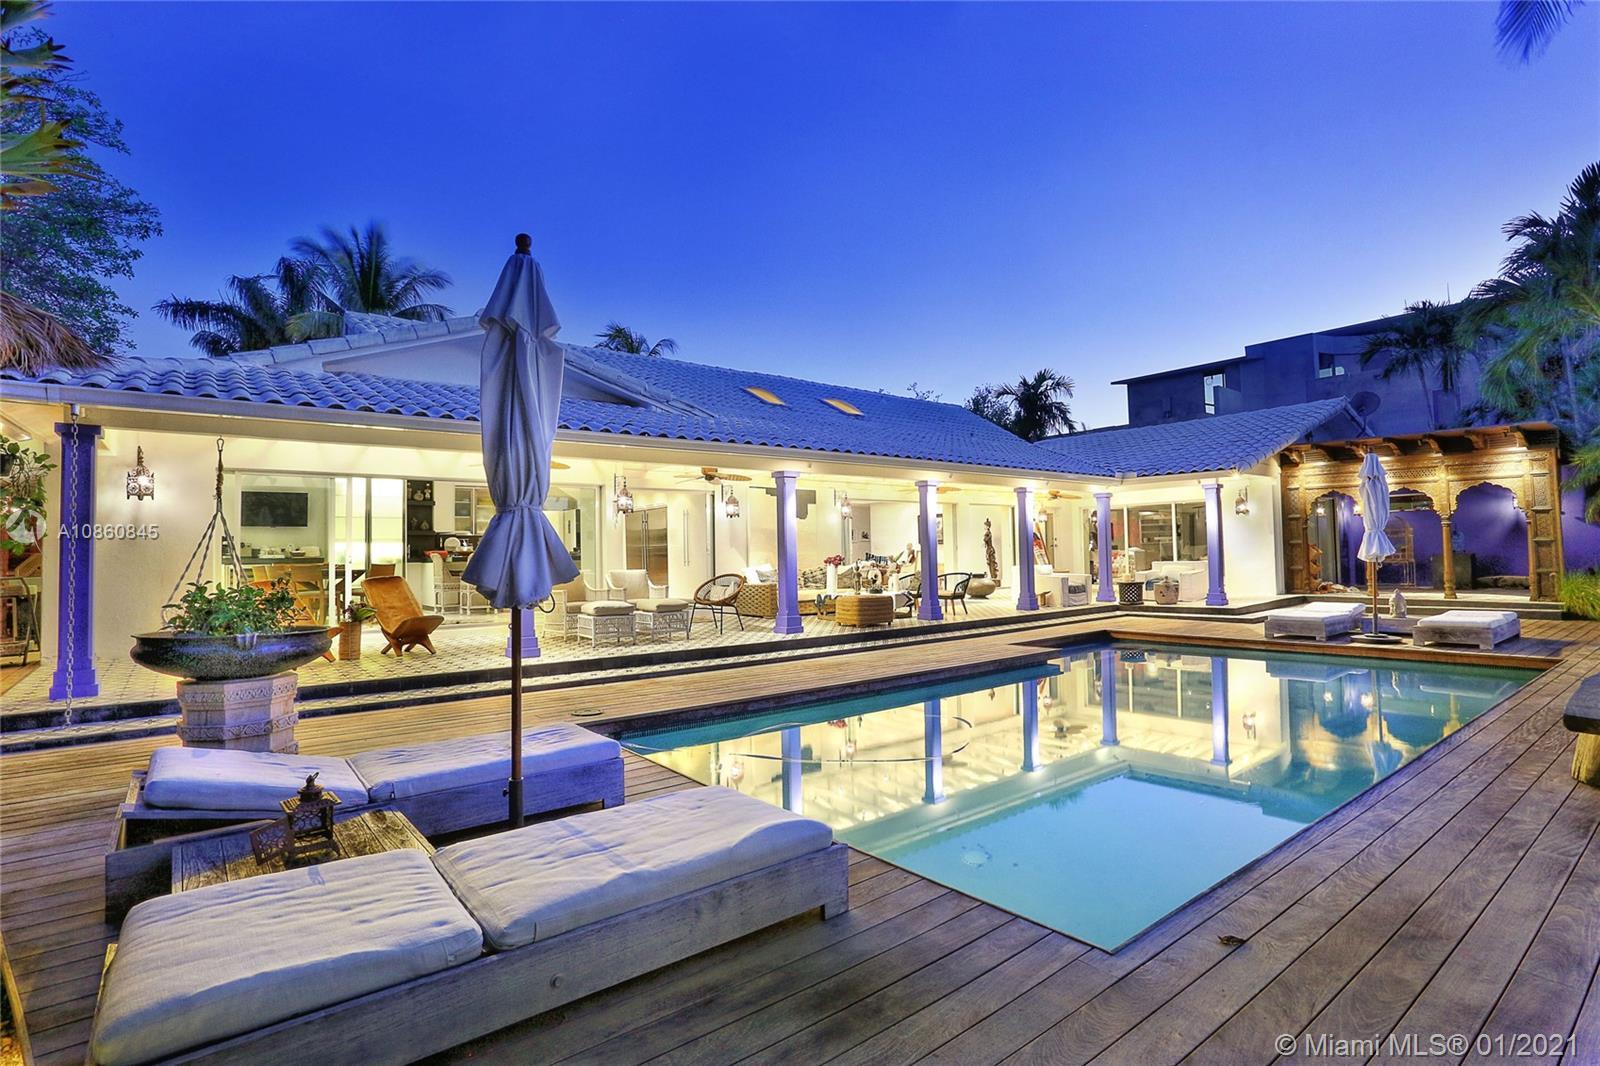 image #1 of property, Cape Florida Sub Sec 3